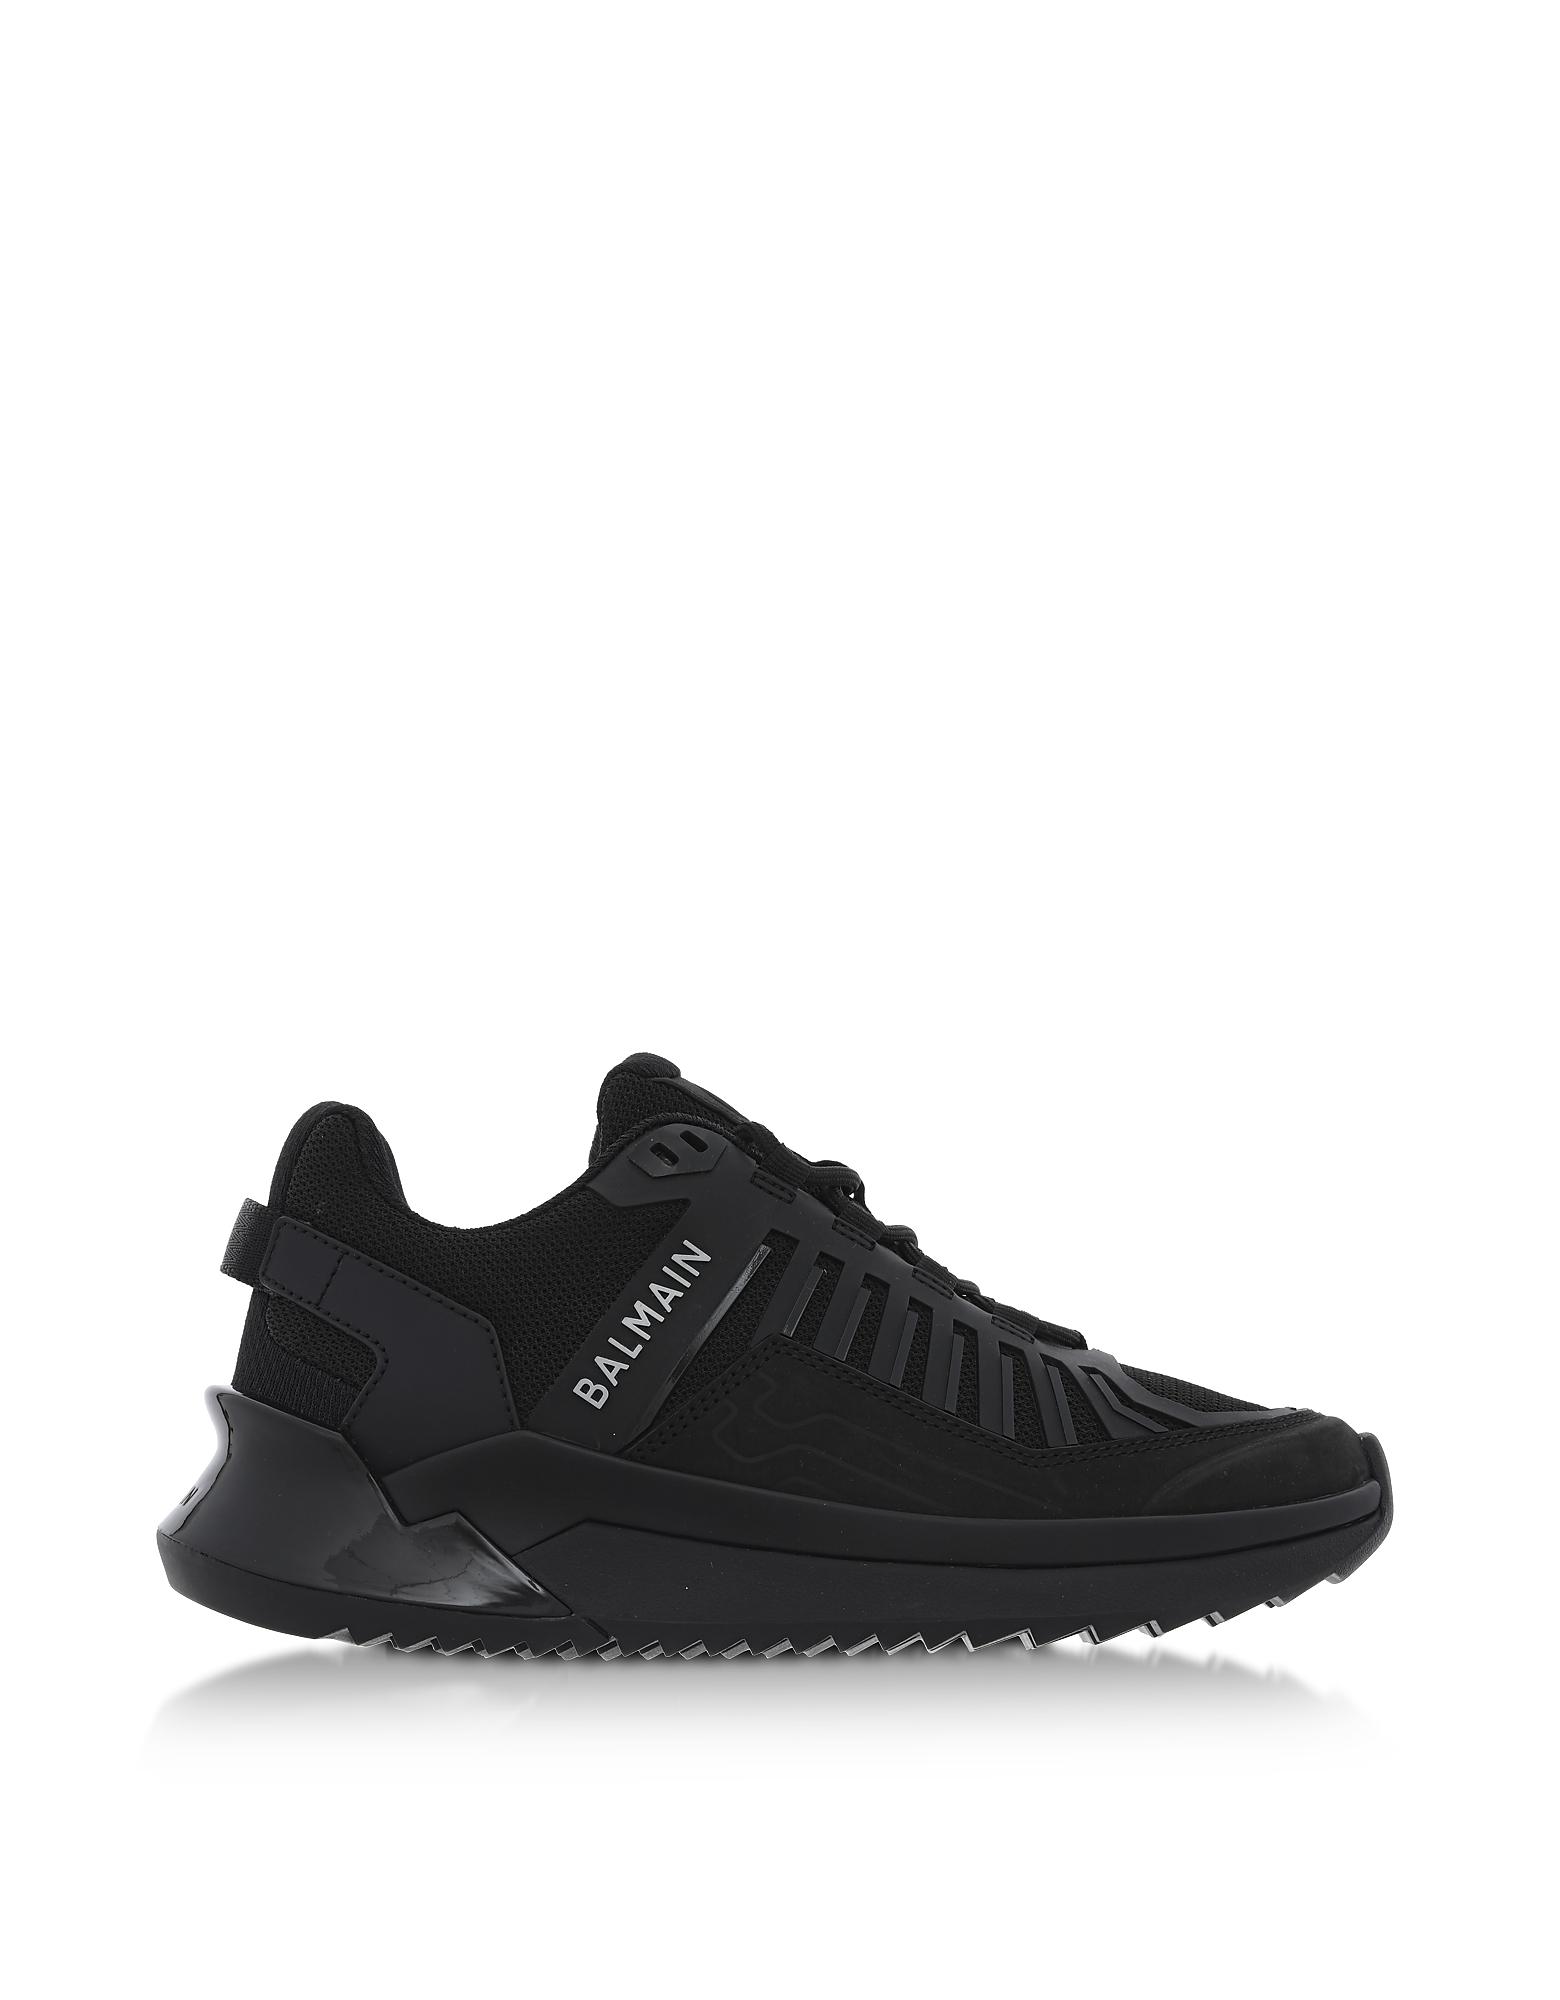 Balmain Designer Shoes, Black Neoprene B-Trail Women's Sneakers